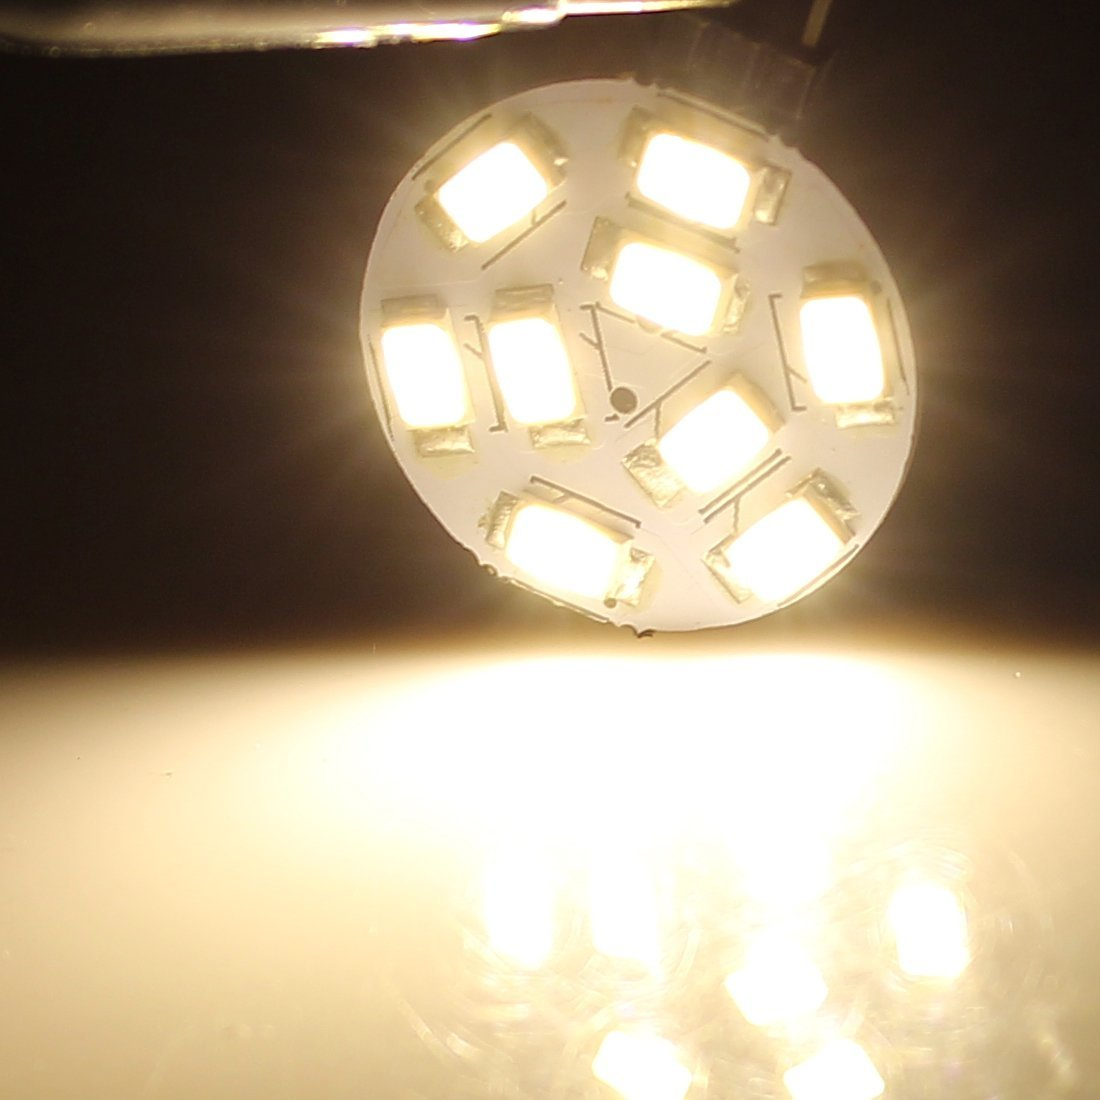 10-30 1.7W G4 de forma redonda 5730 SMD 350LM Bombilla LED 9 5 piezas de blanco cálido - - Amazon.com